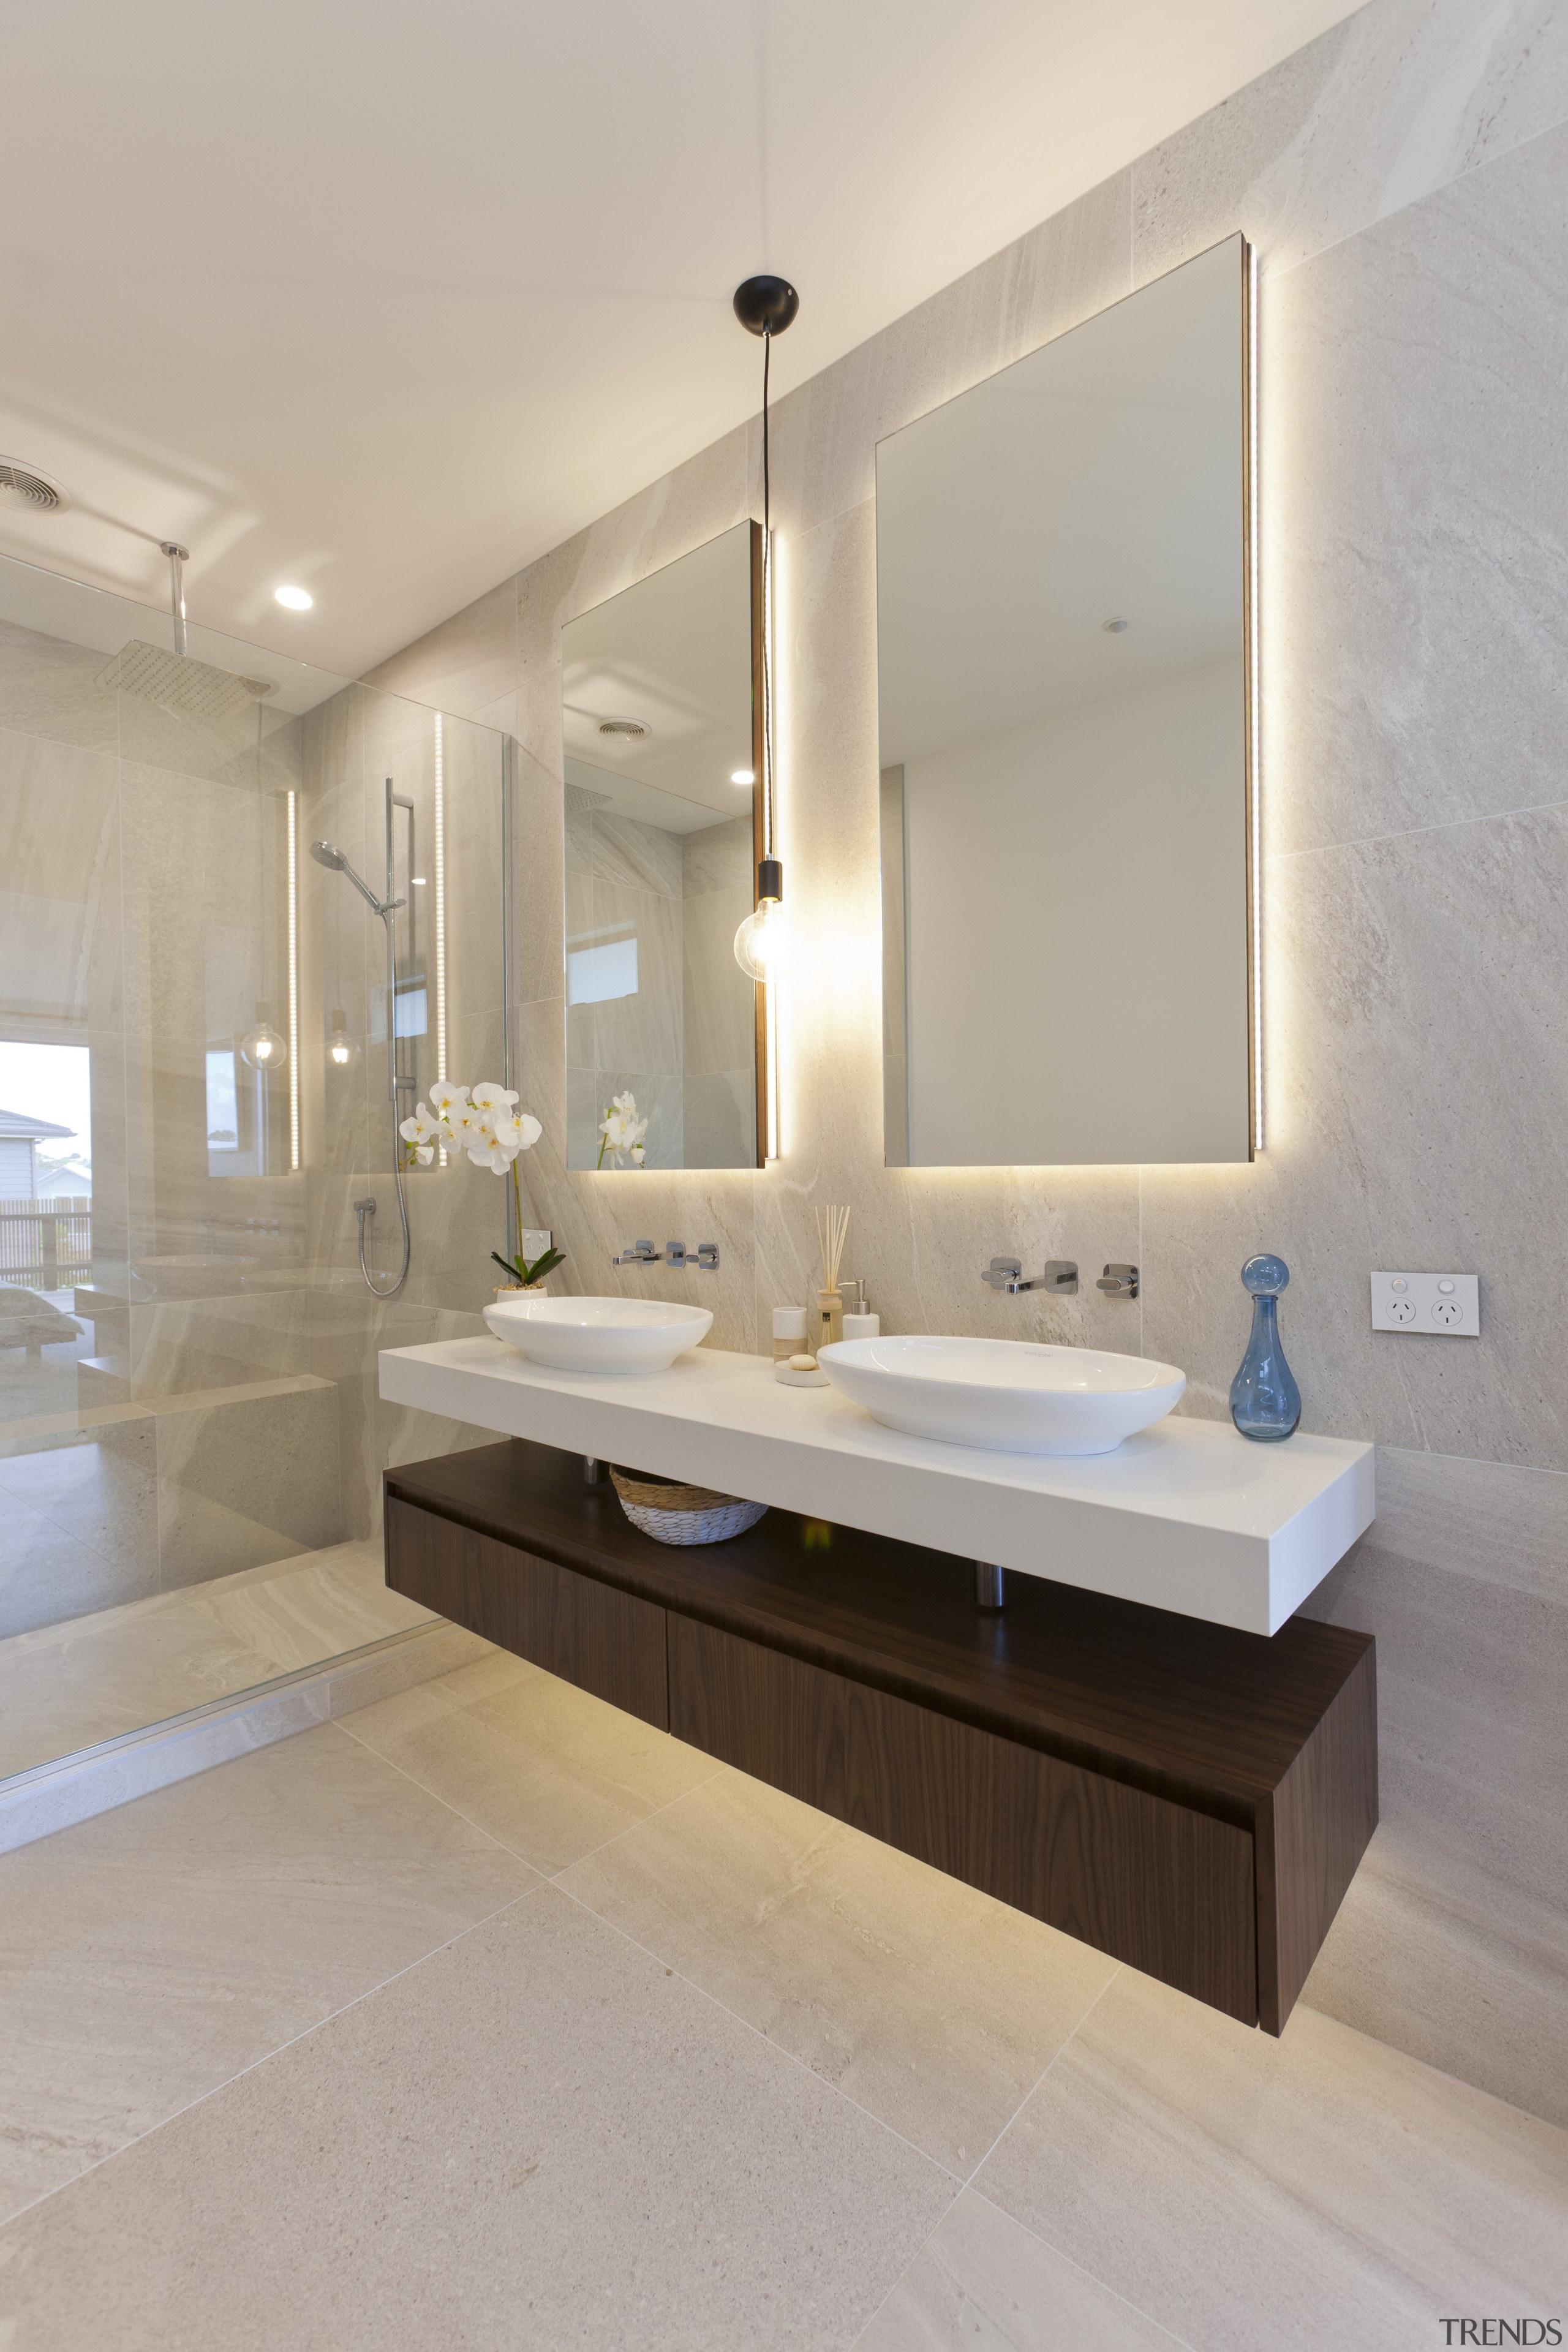 Landmark Homes Design & Build Showhome Bathroom bathroom, floor, home, interior design, plumbing fixture, room, sink, gray